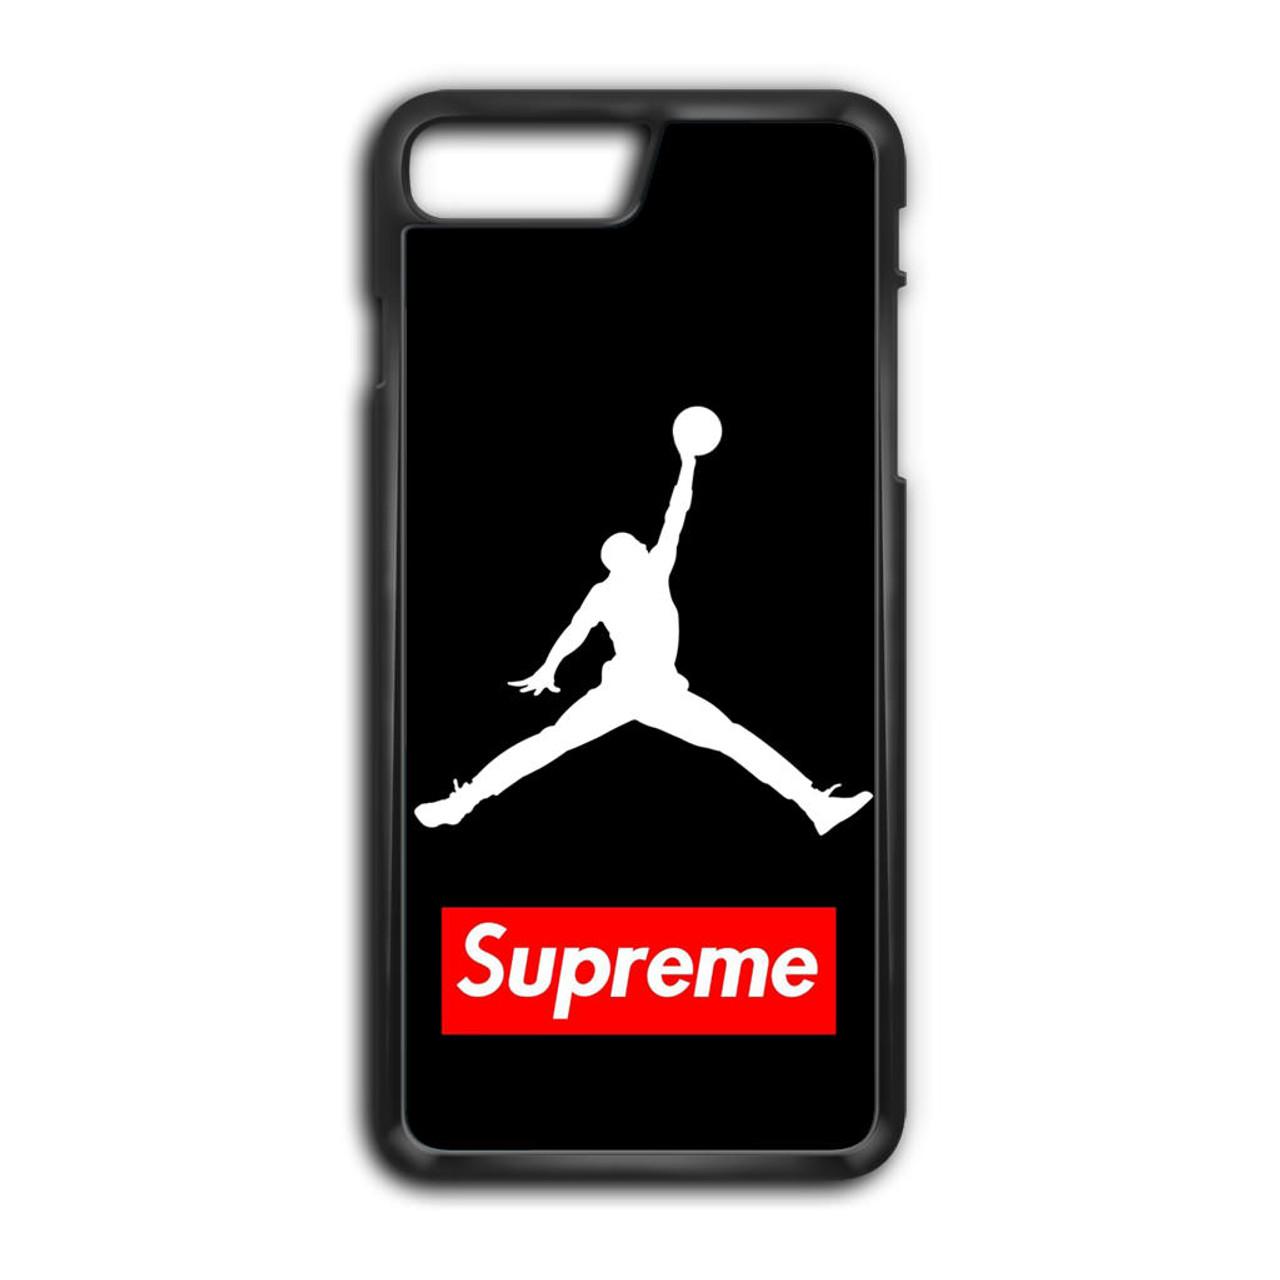 e2569e56bd70 Supreme Air Jordan iPhone 7 Plus Case - GGIANS